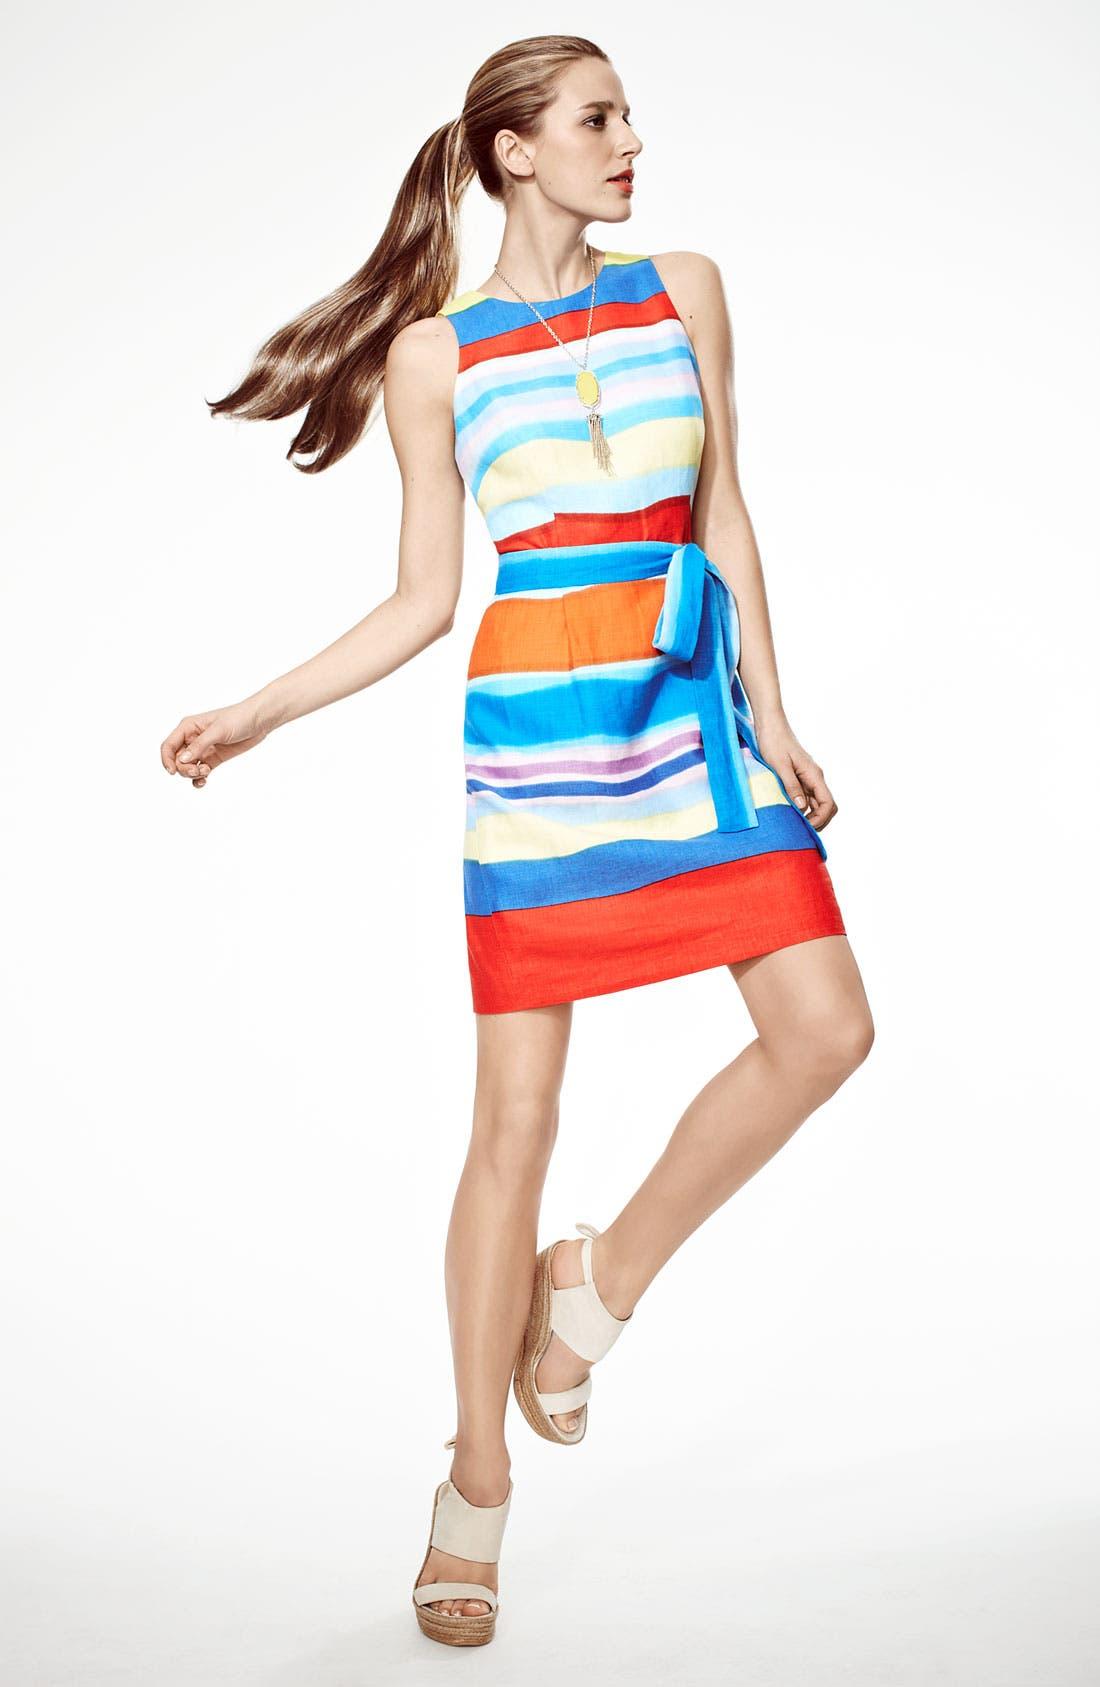 Main Image - Donna Morgan Dress & Accessories